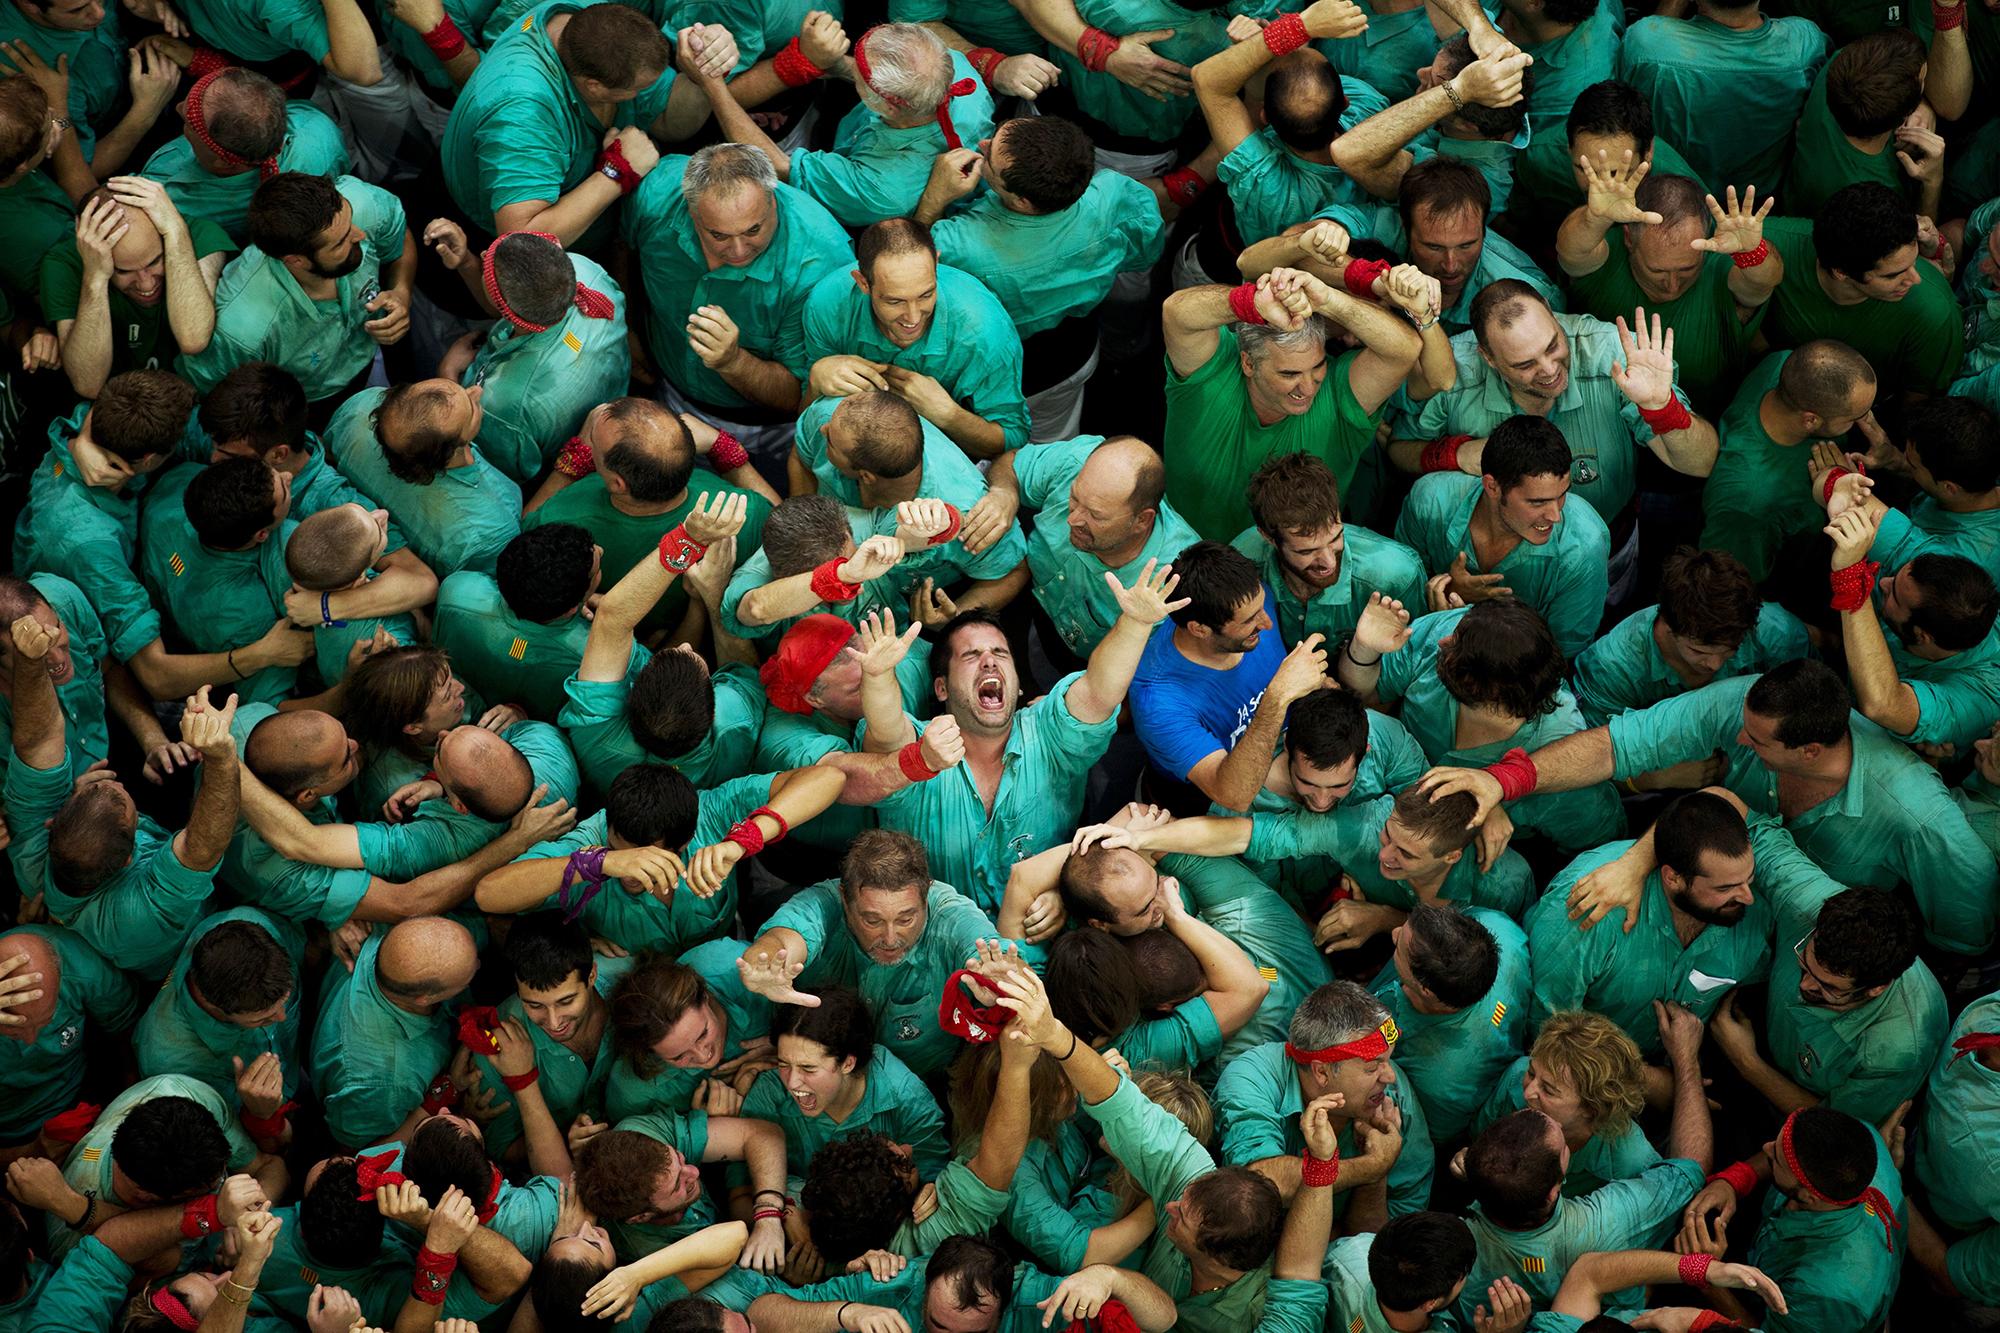 Castellers de Villafranca  react after completing their human tower in Tarragona, Spain, on Oct. 2, 2016.